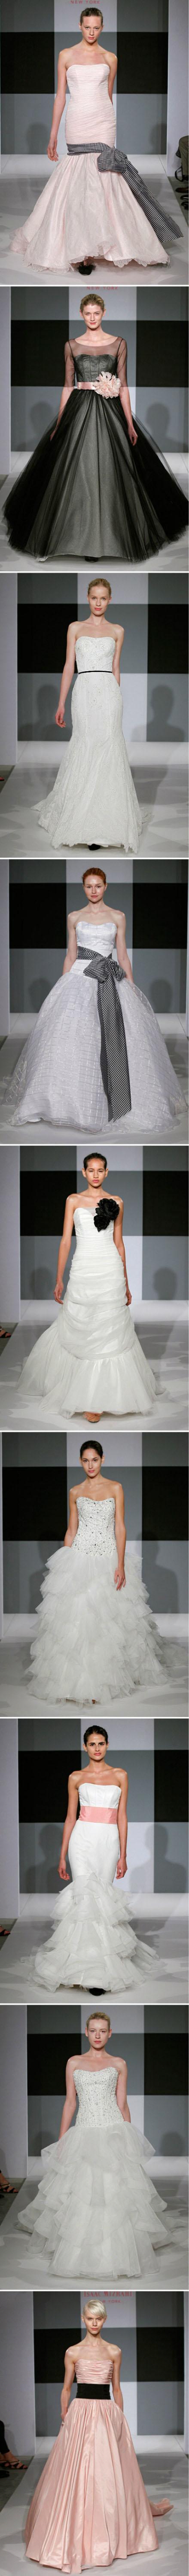 Isaac Mizrahi Wedding Dresses, White is the mainstream, multi ...